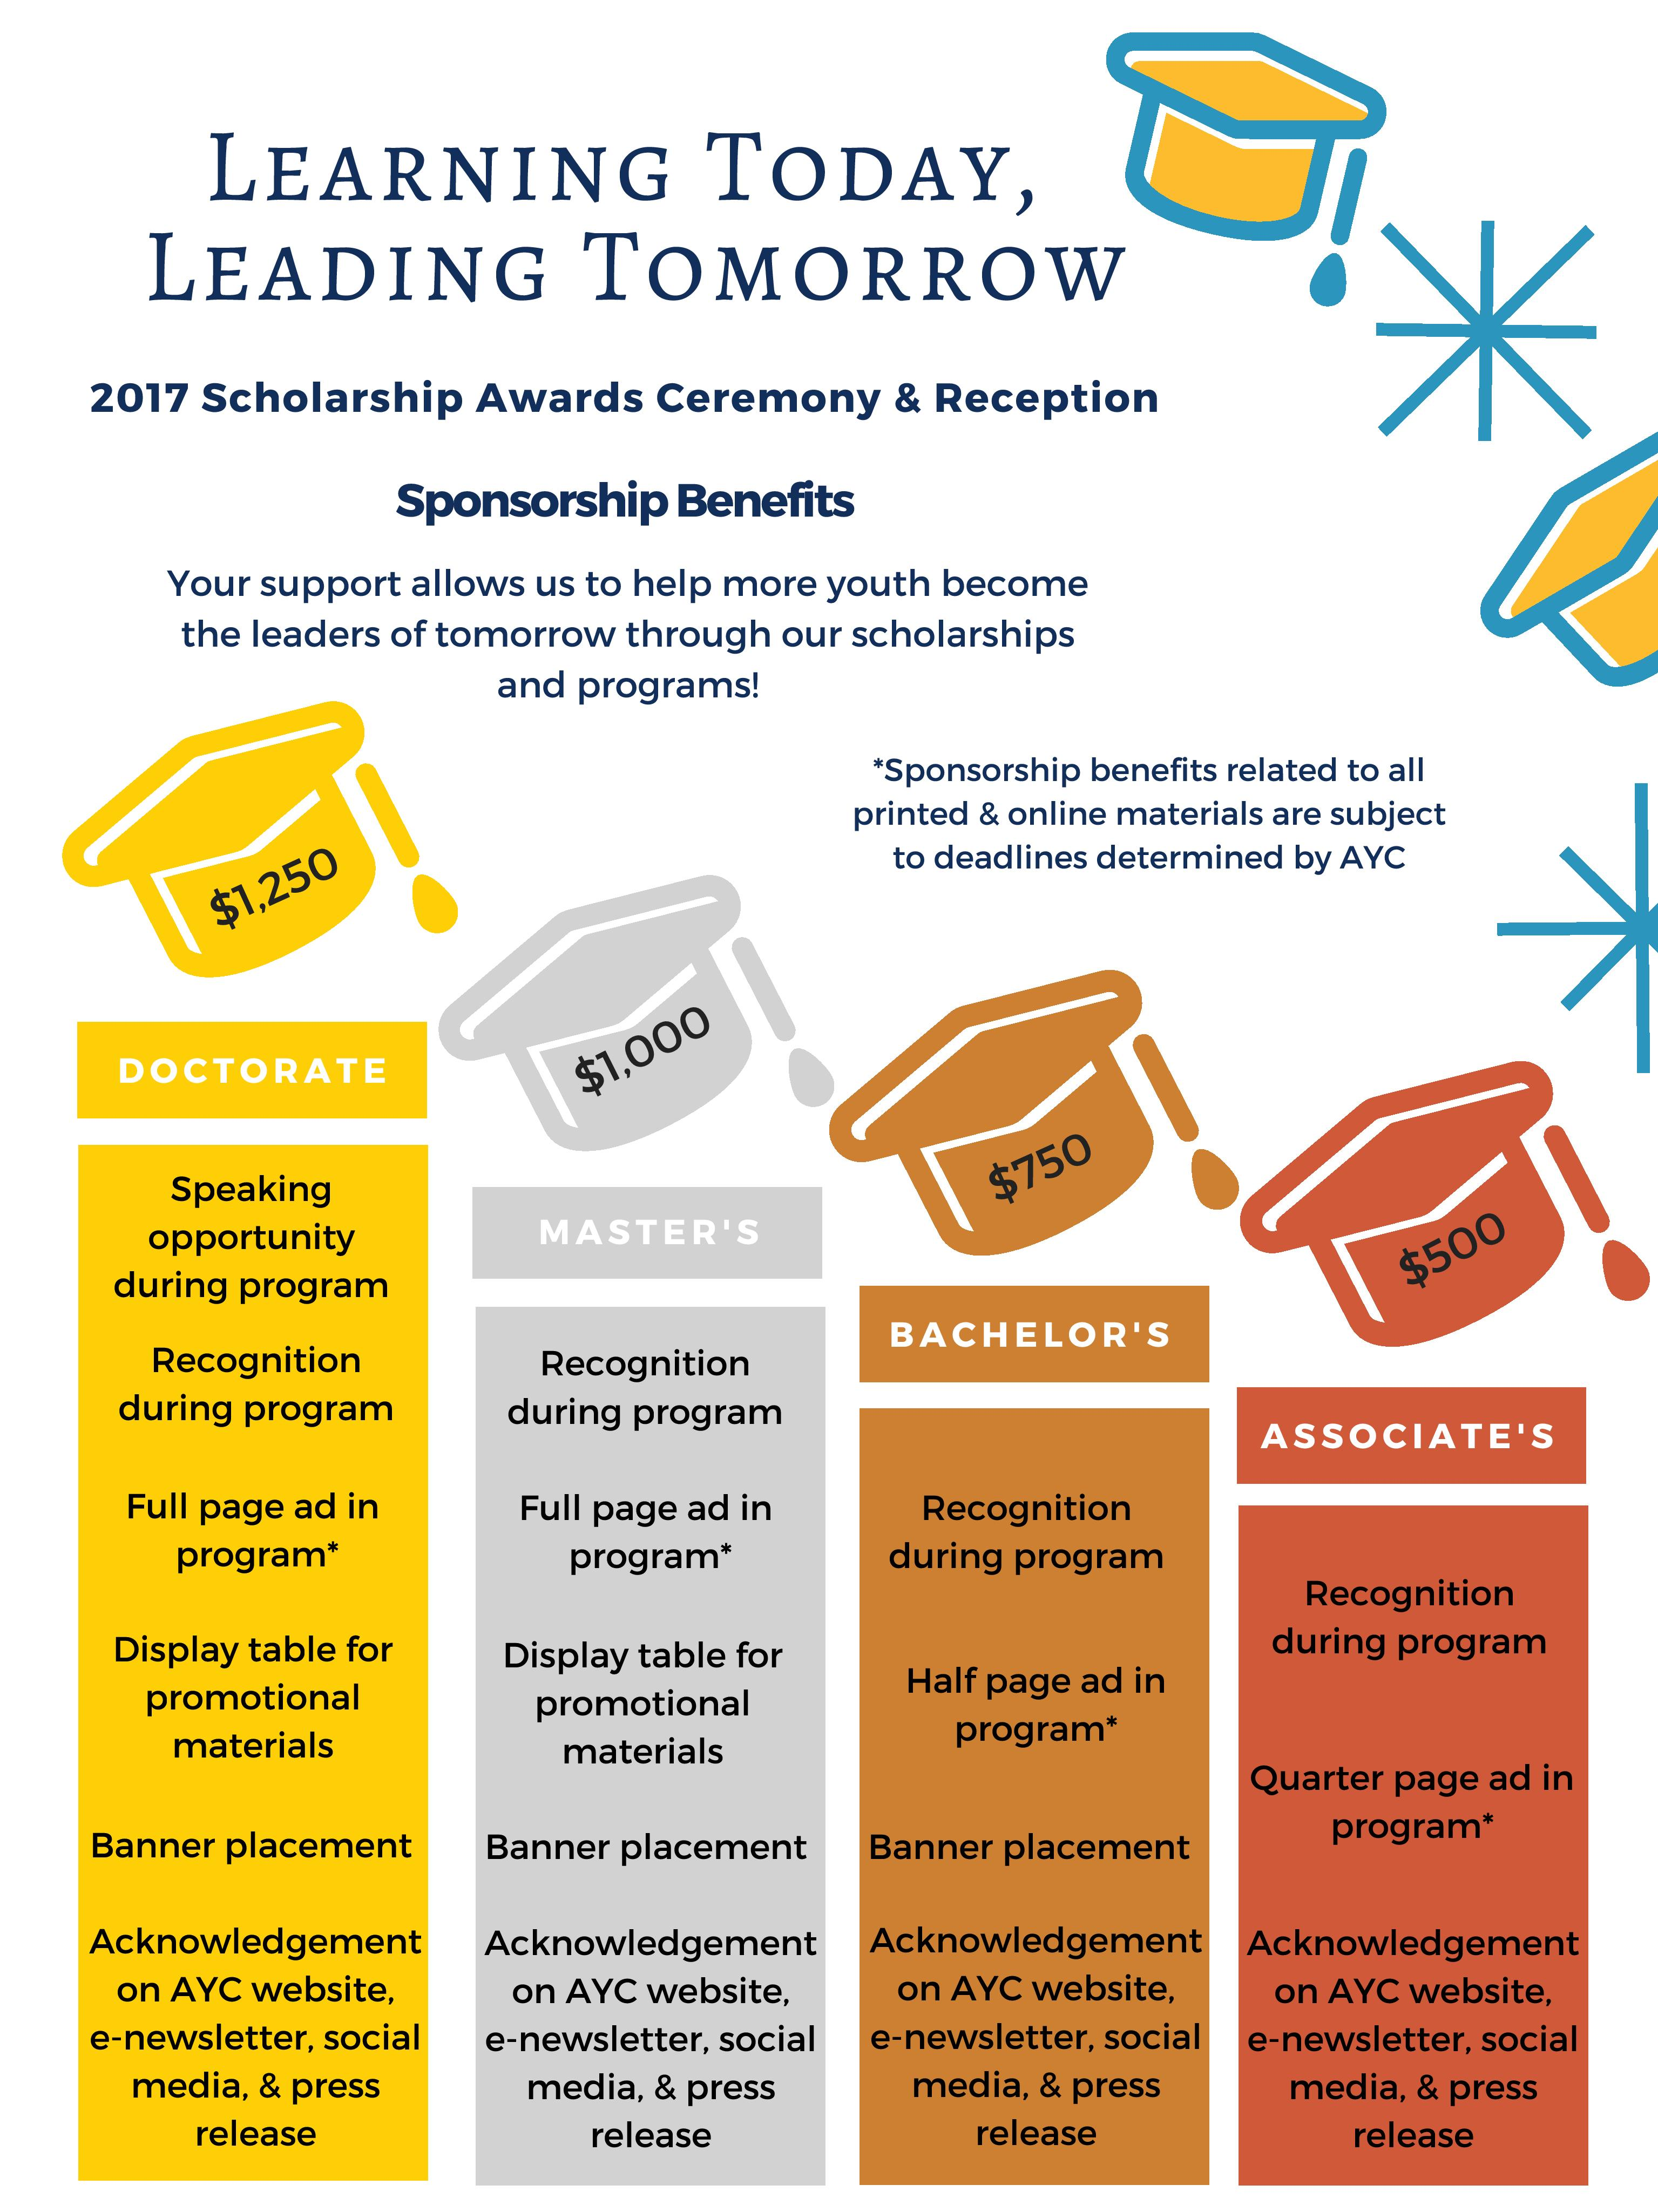 2017 Scholarship Awards Sponsorship Benefits